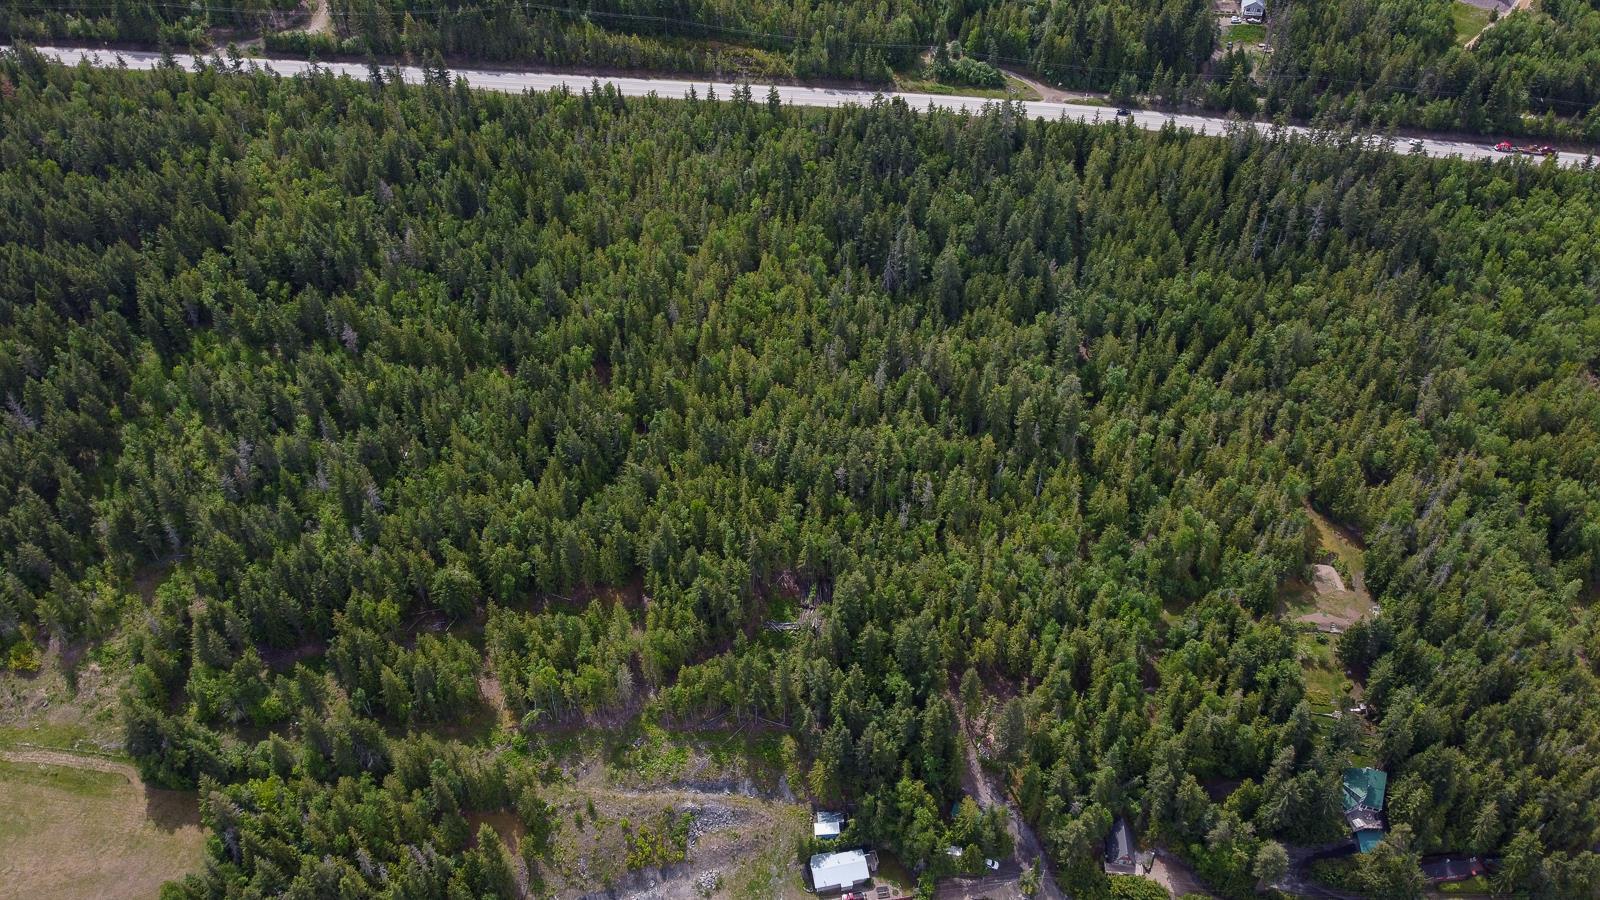 Lot 1-5 Blind Bay Road,, Blind Bay, British Columbia  V0E 1H0 - Photo 25 - 10232466